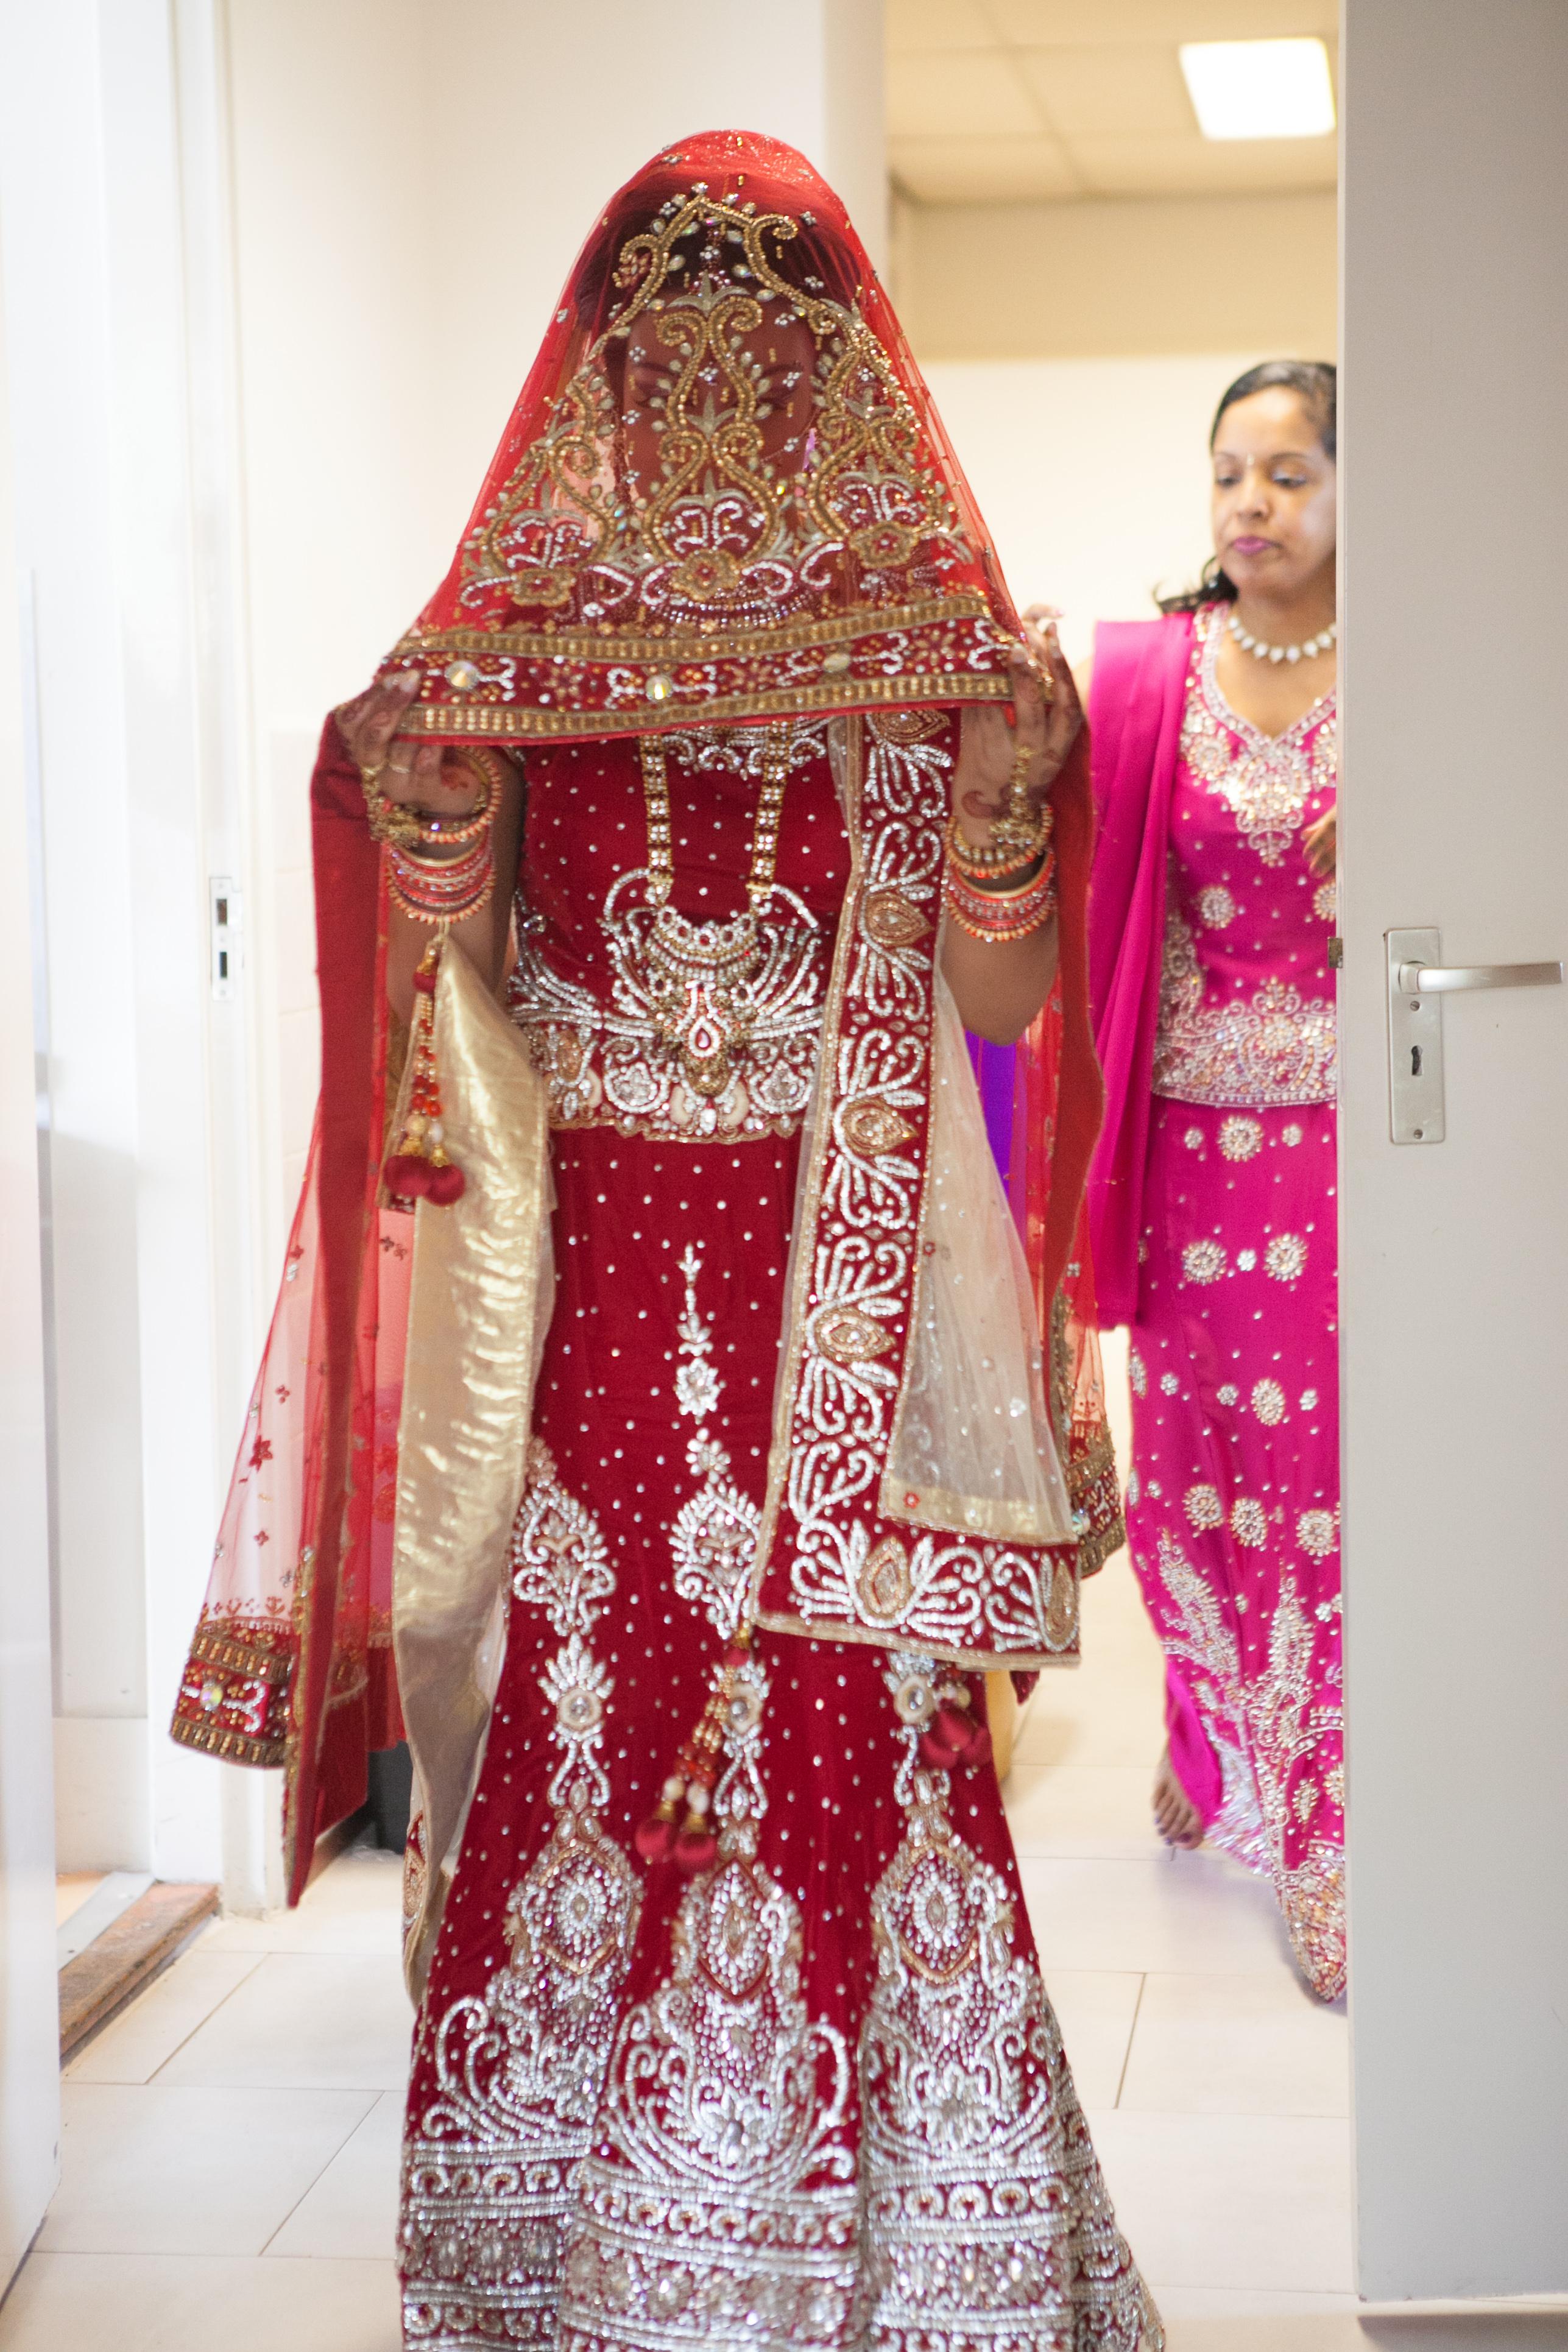 bhatwaan kleding